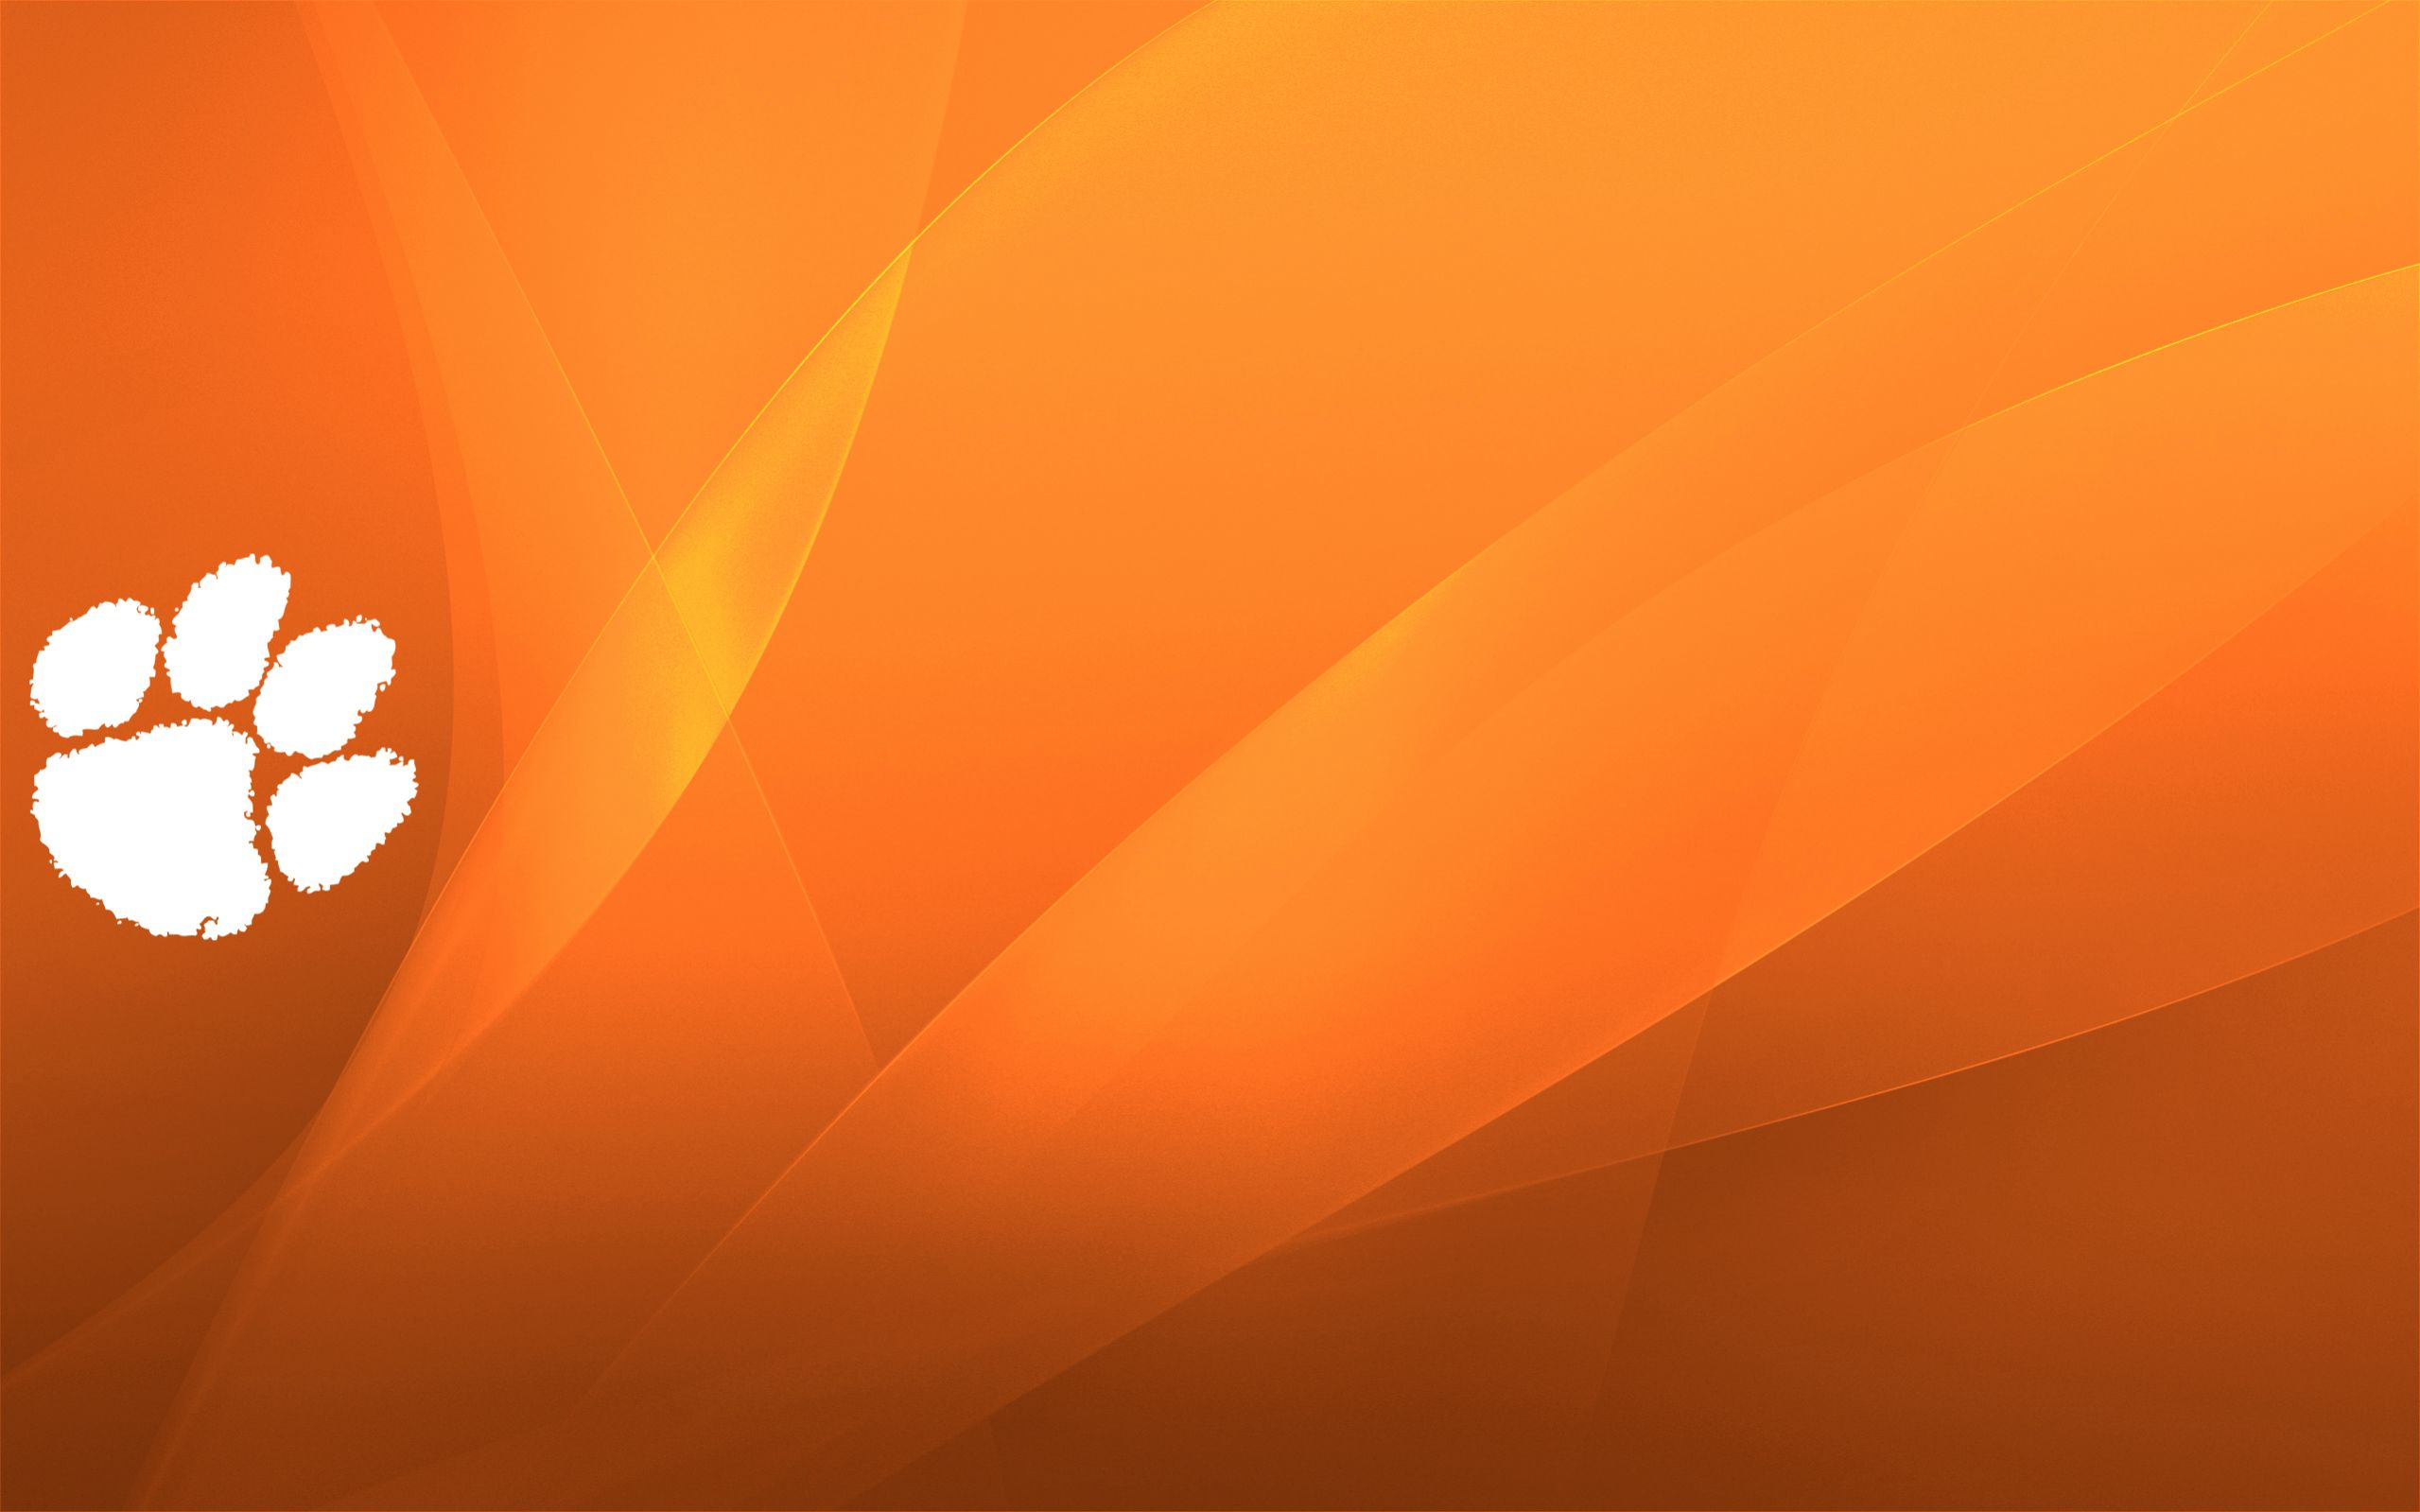 Hd Wallpapers Clemson Tigers 800 X 450 87 Kb Jpeg HD Wallpapers 2559x1599